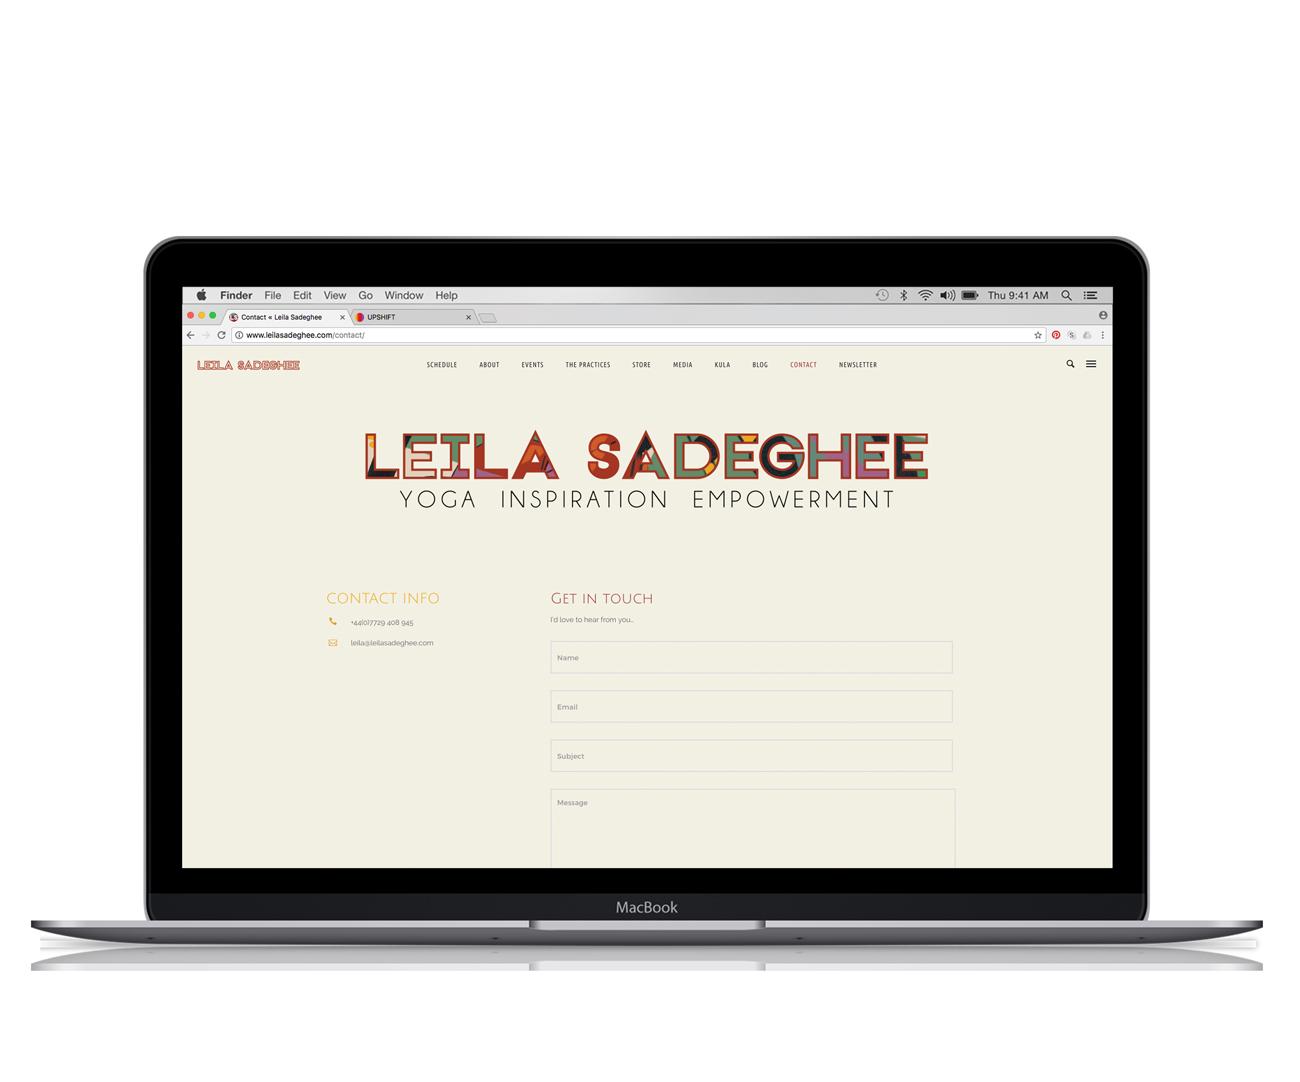 www.leilasadeghee.com